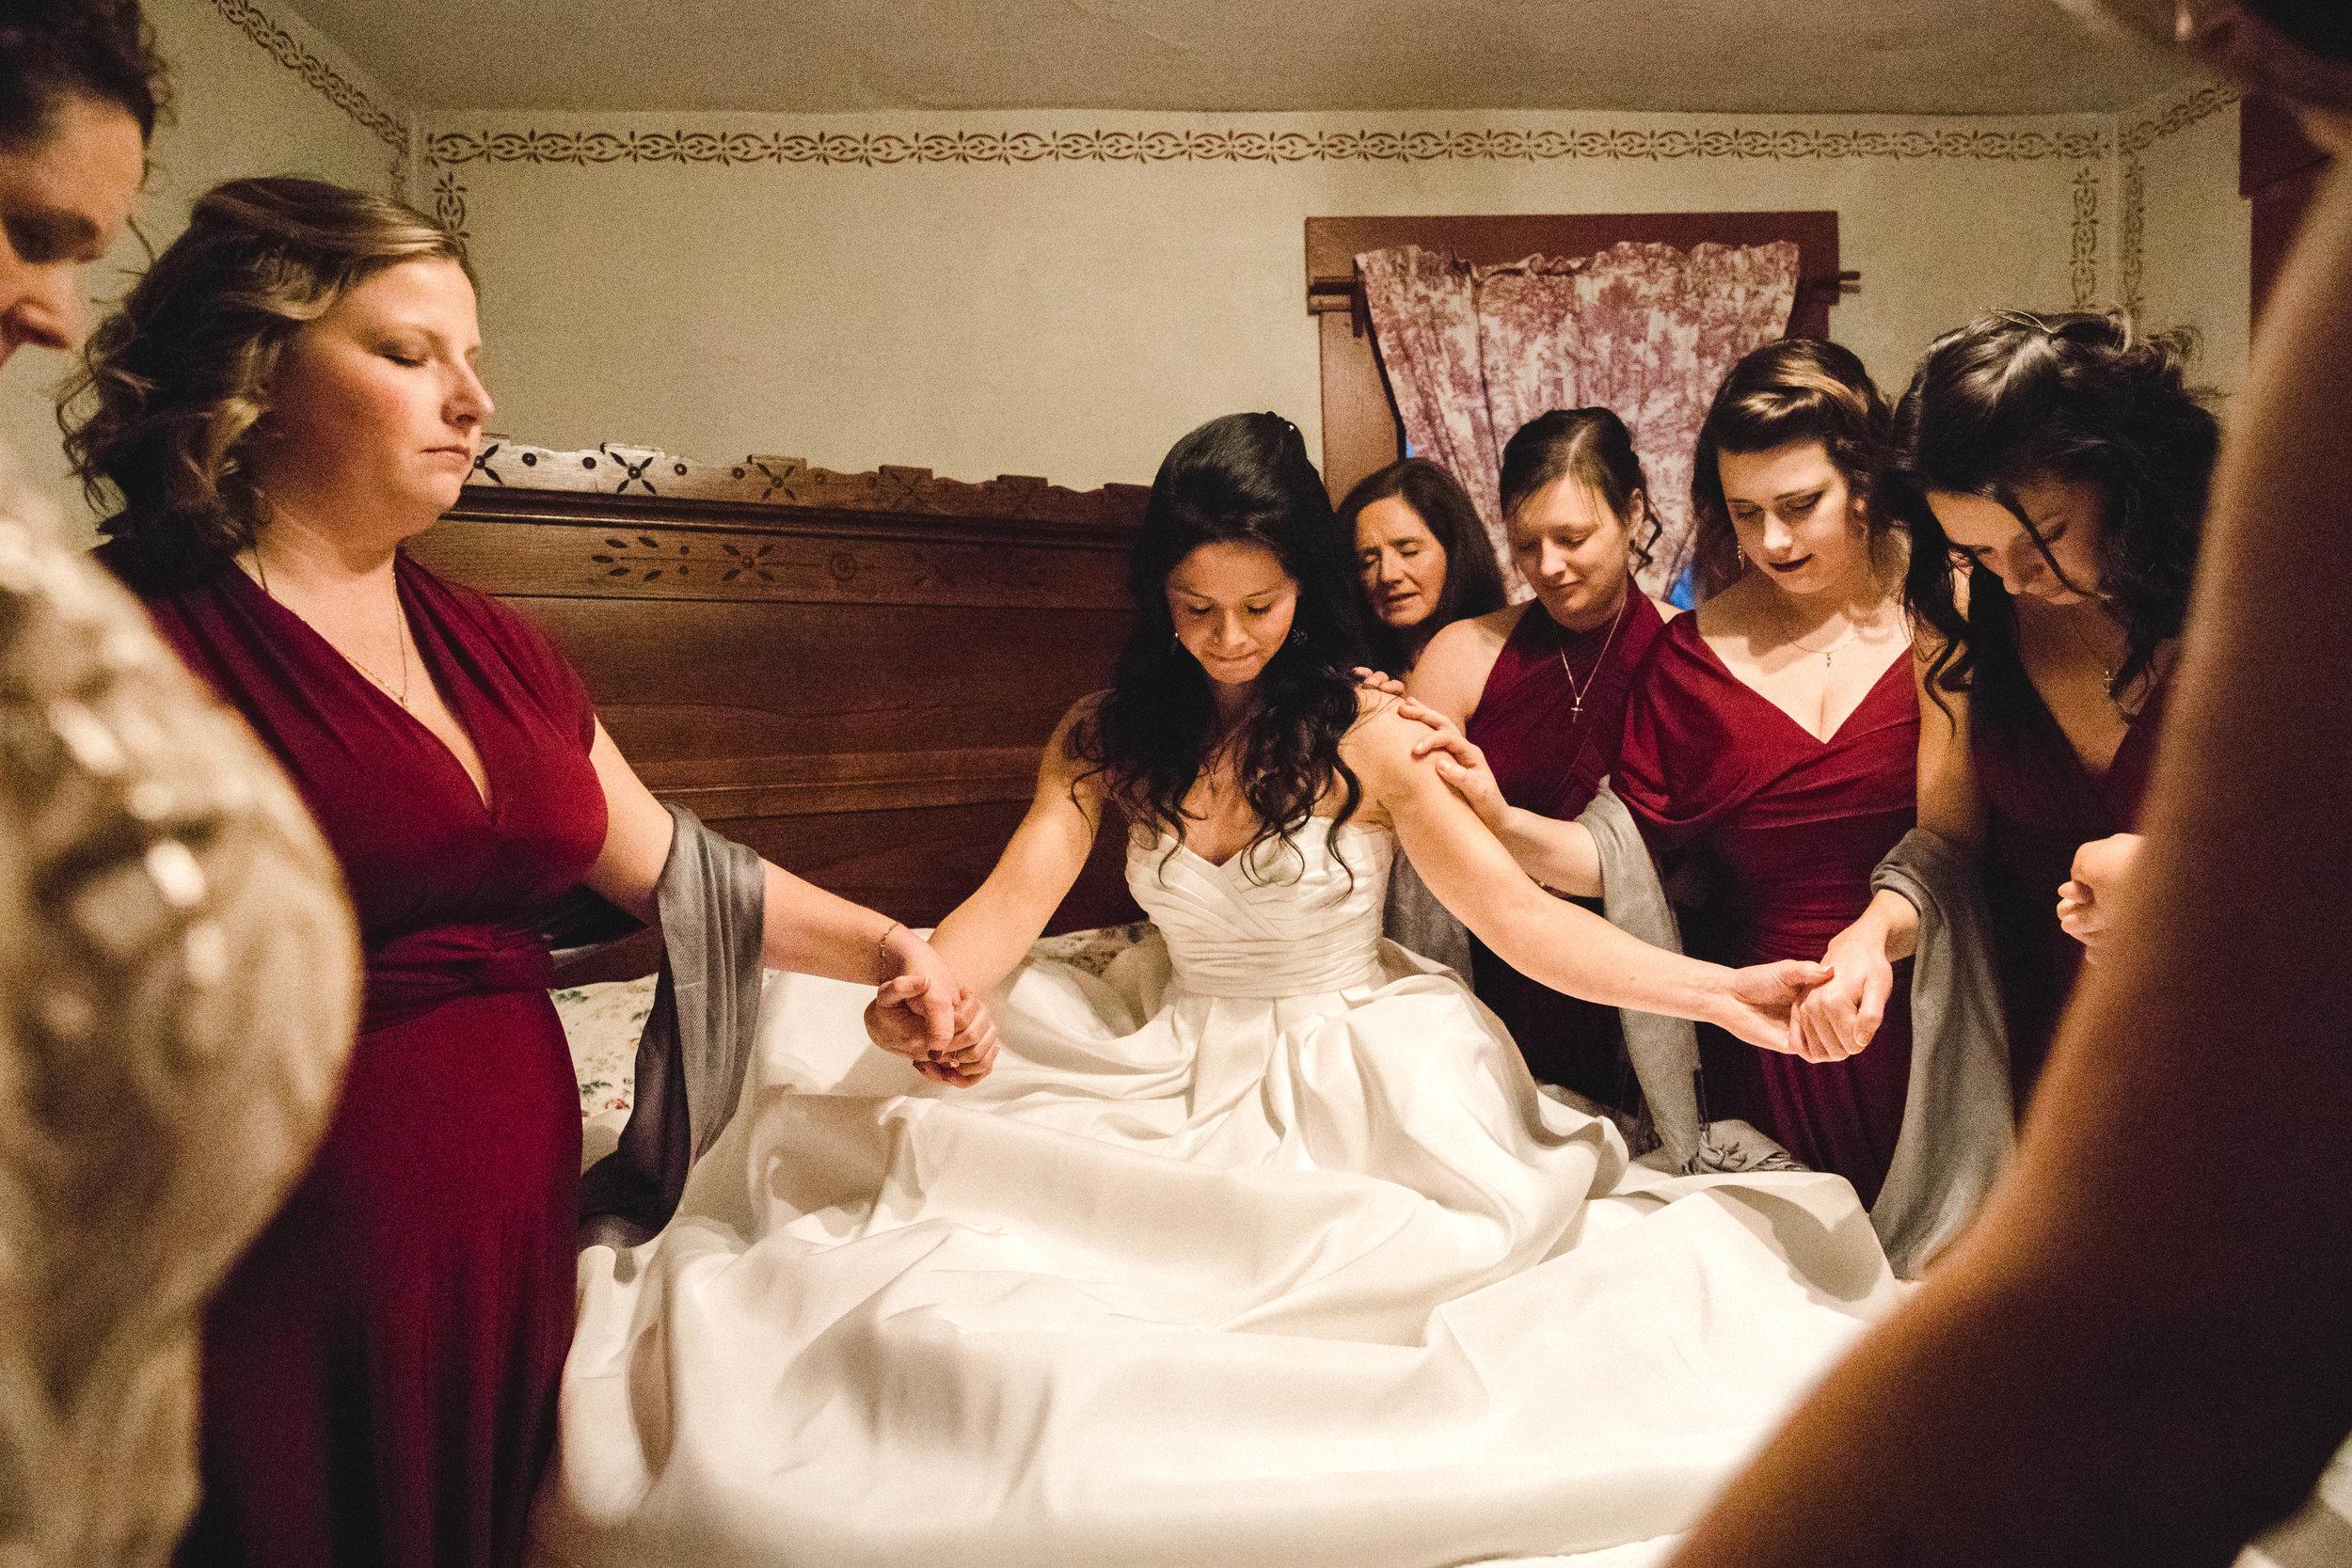 bride praying with bridesmaids before wedding ceremony